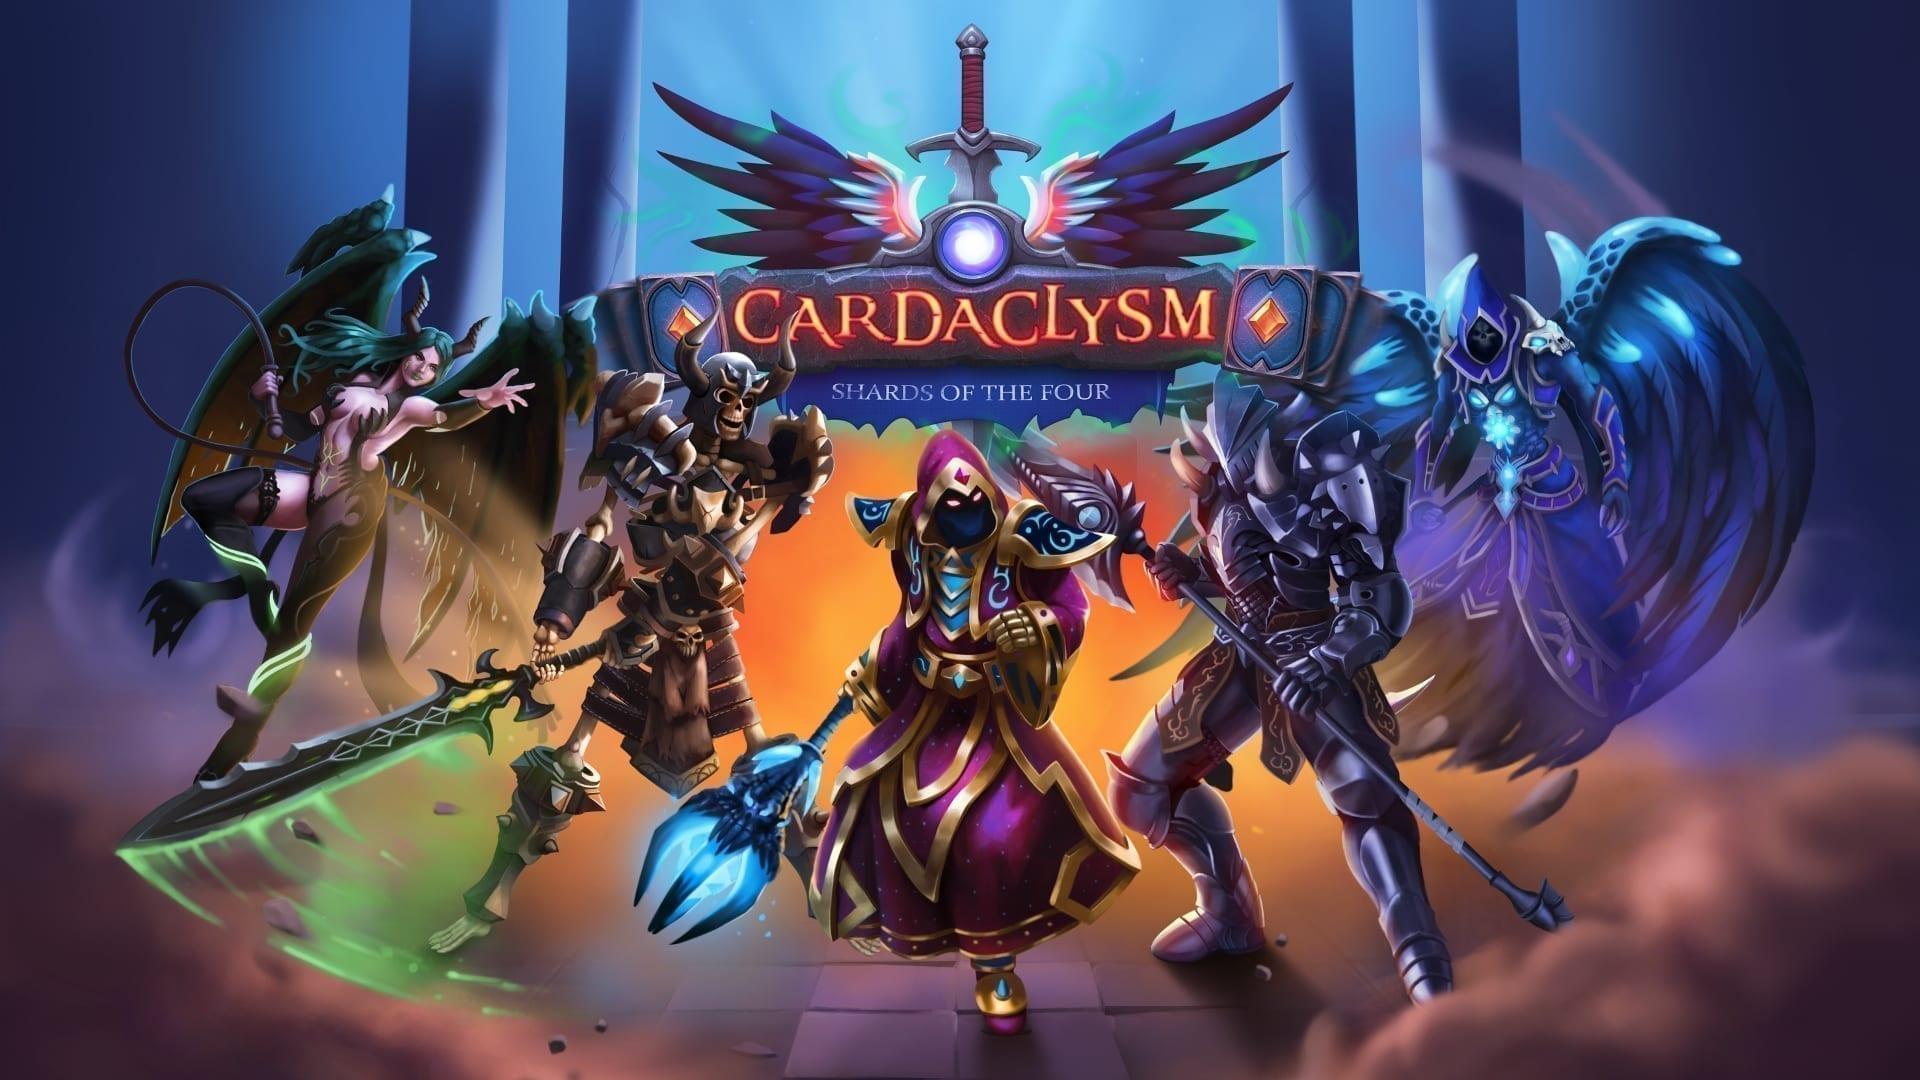 Card Battler Special Teil 2 Cardaclysm KeyArt